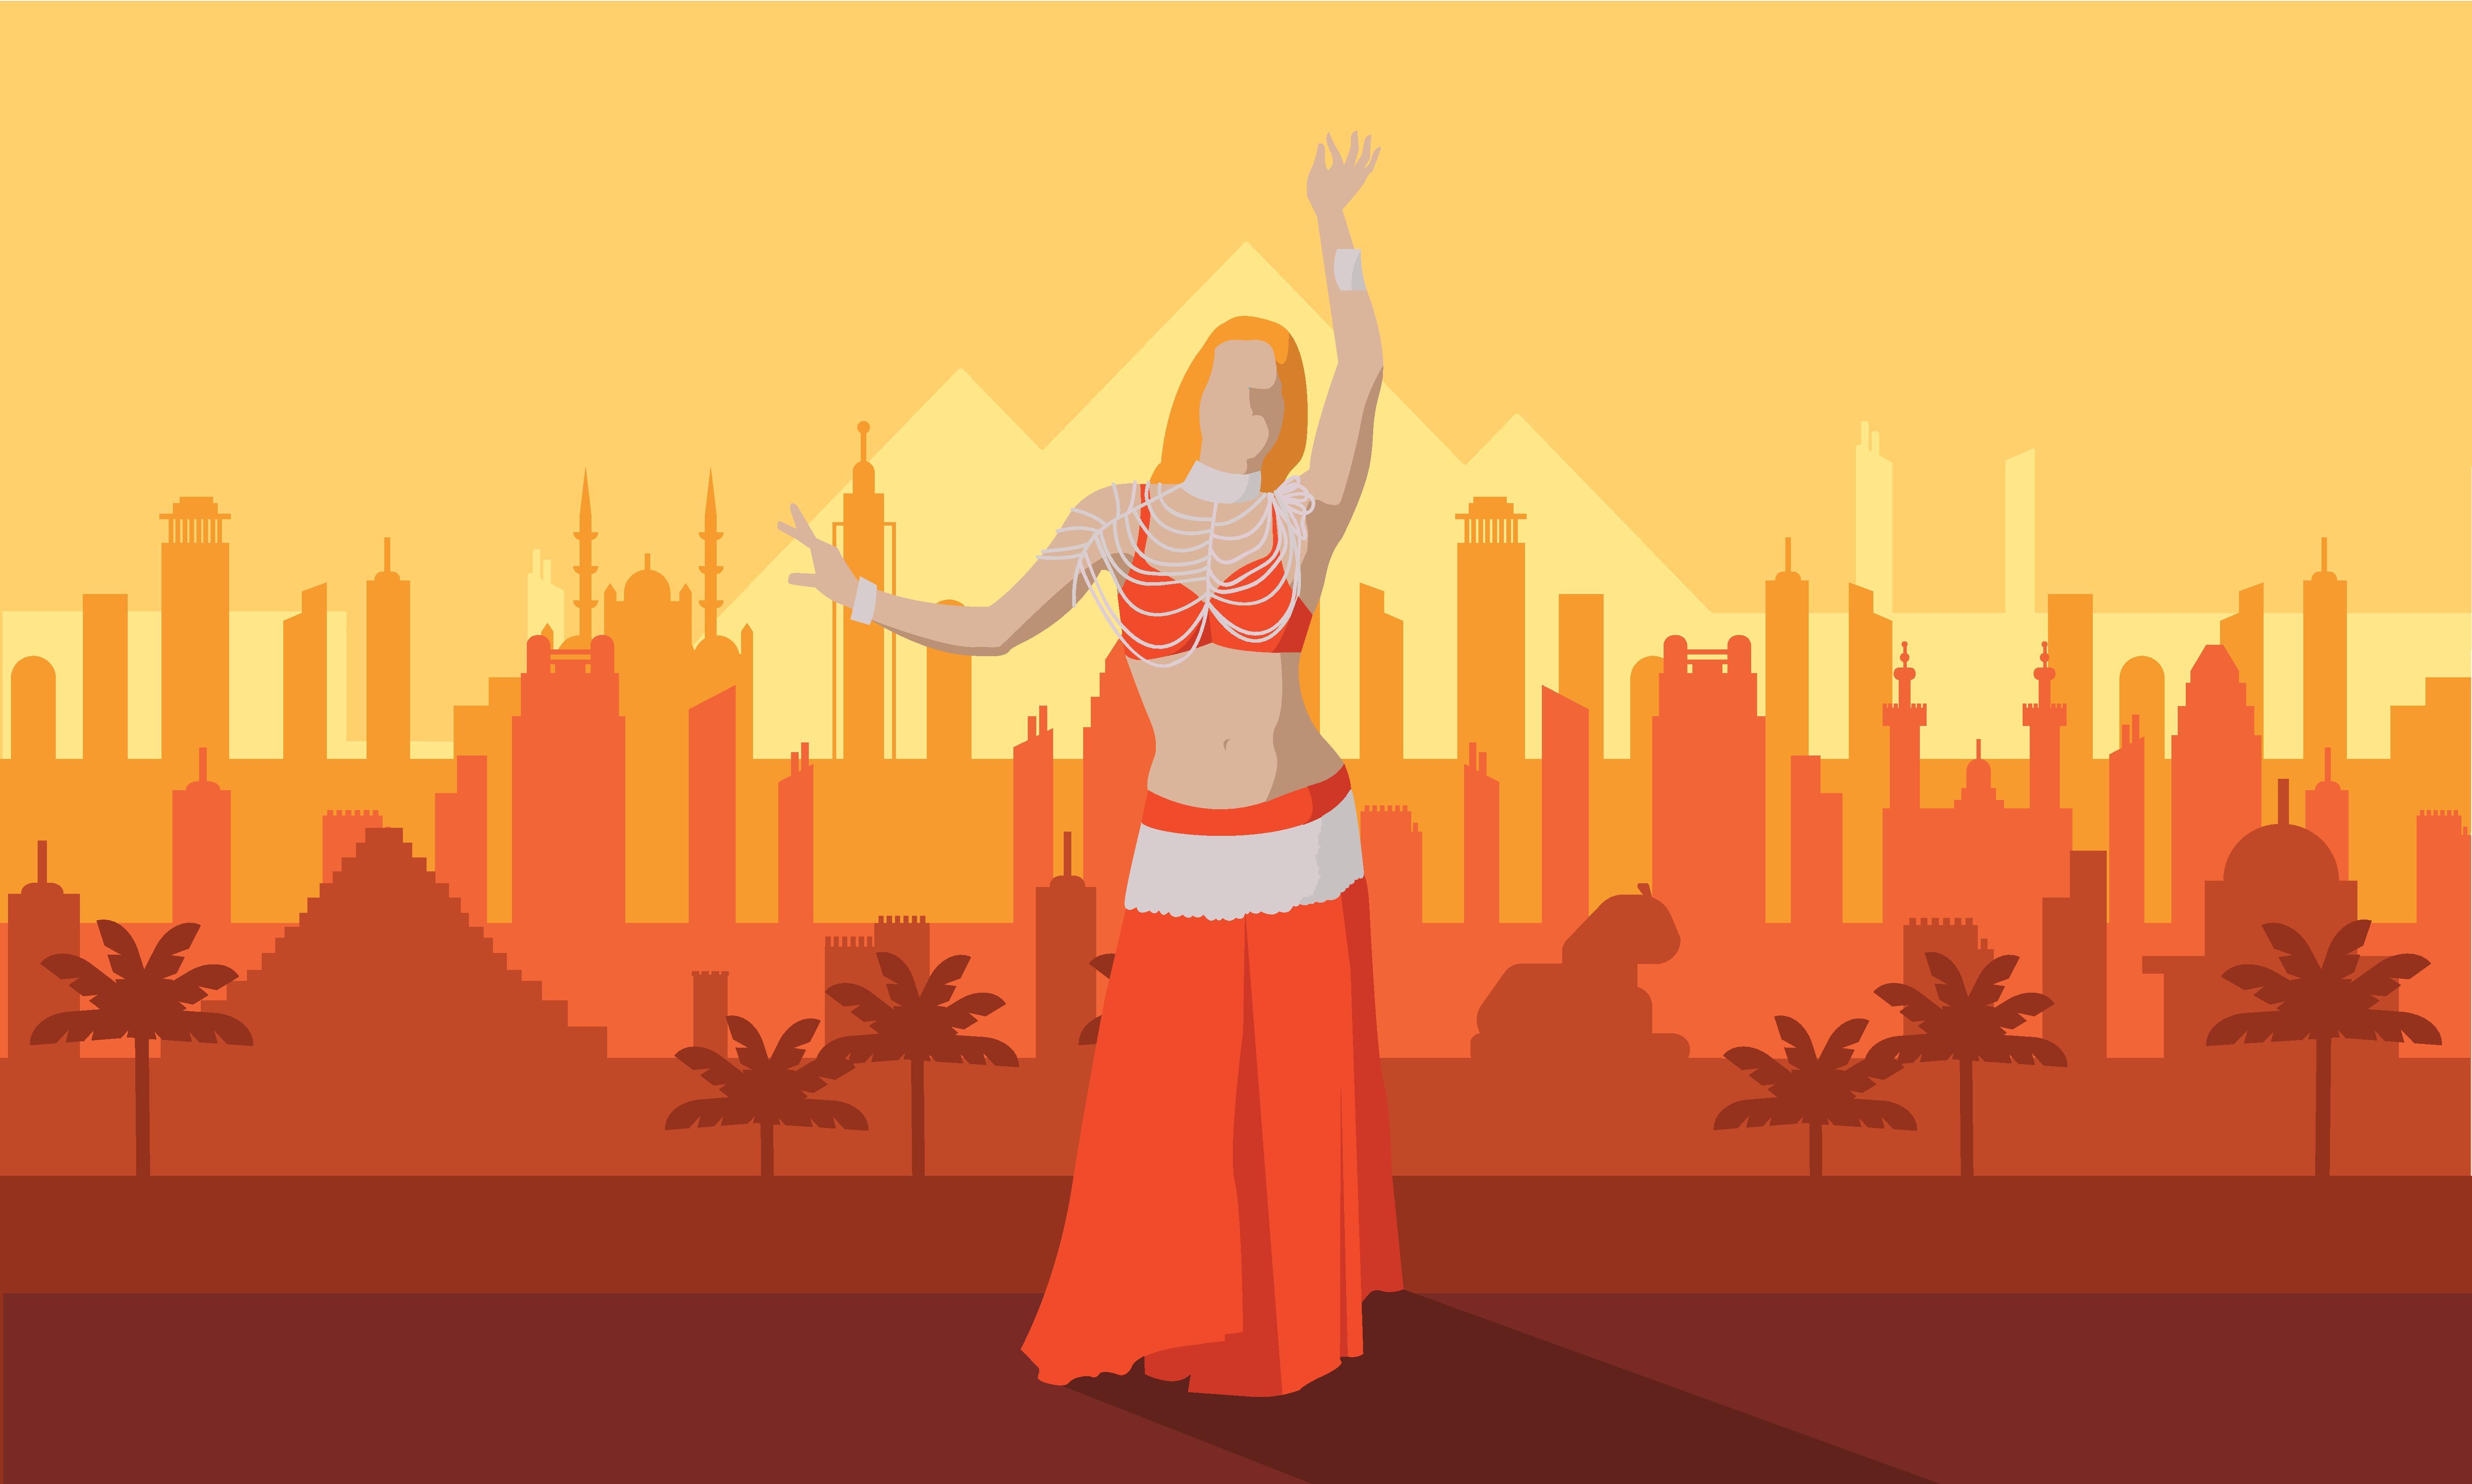 Cours de Danse Orientale en vidéo